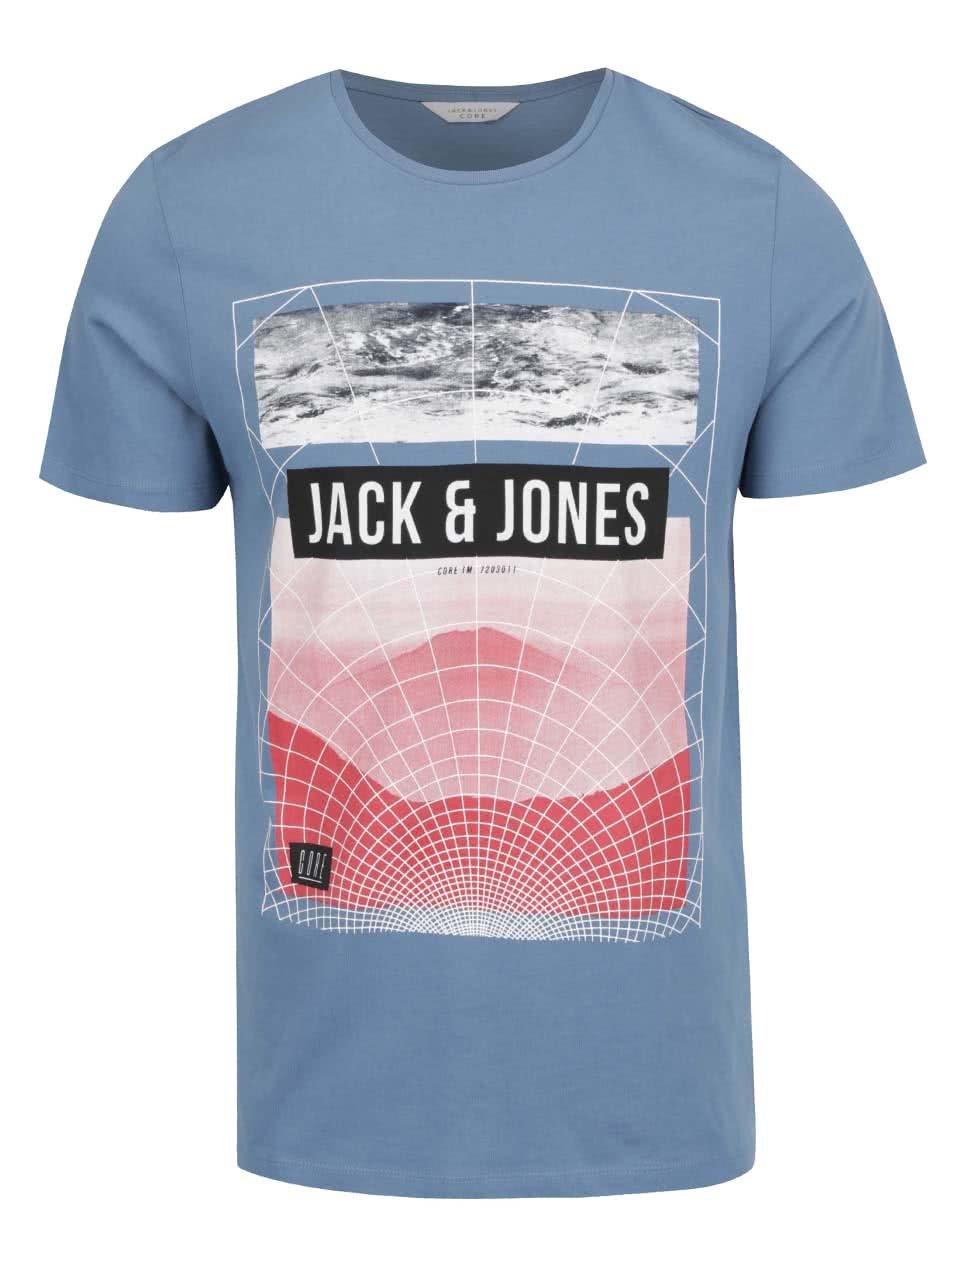 Modré triko s barevným potiskem Jack & Jones